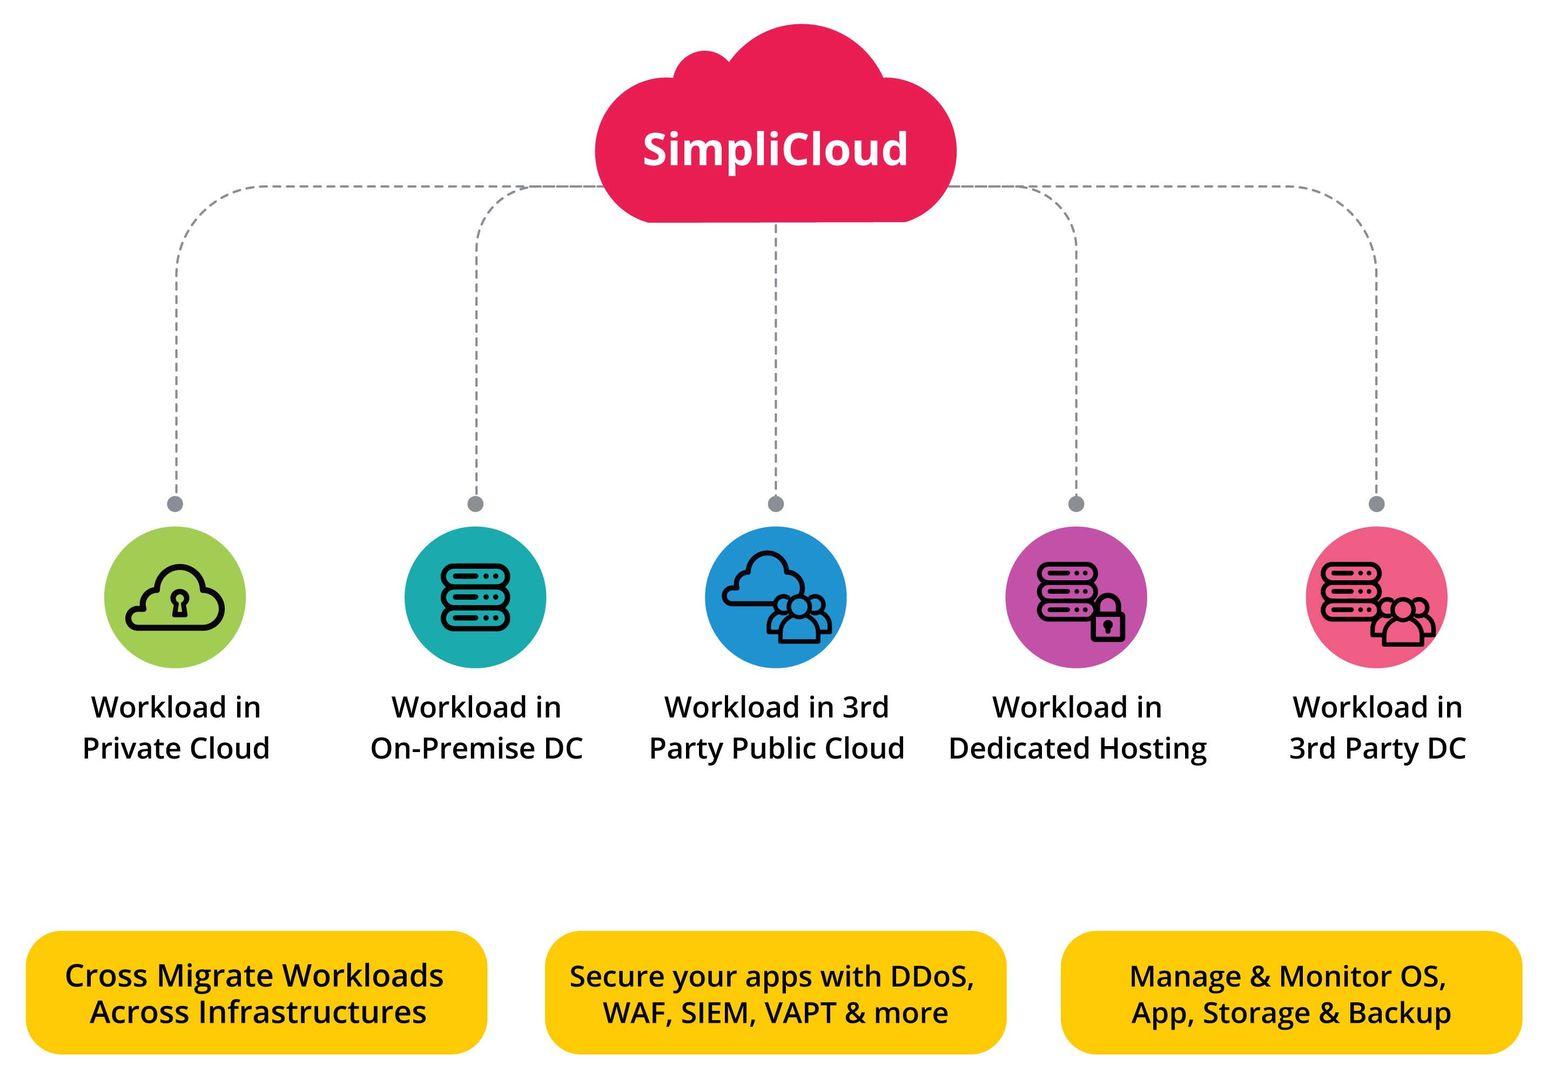 Cloud Infrastructure Service - Cloud Computing & Hosting Providers | NTT-Netmagic